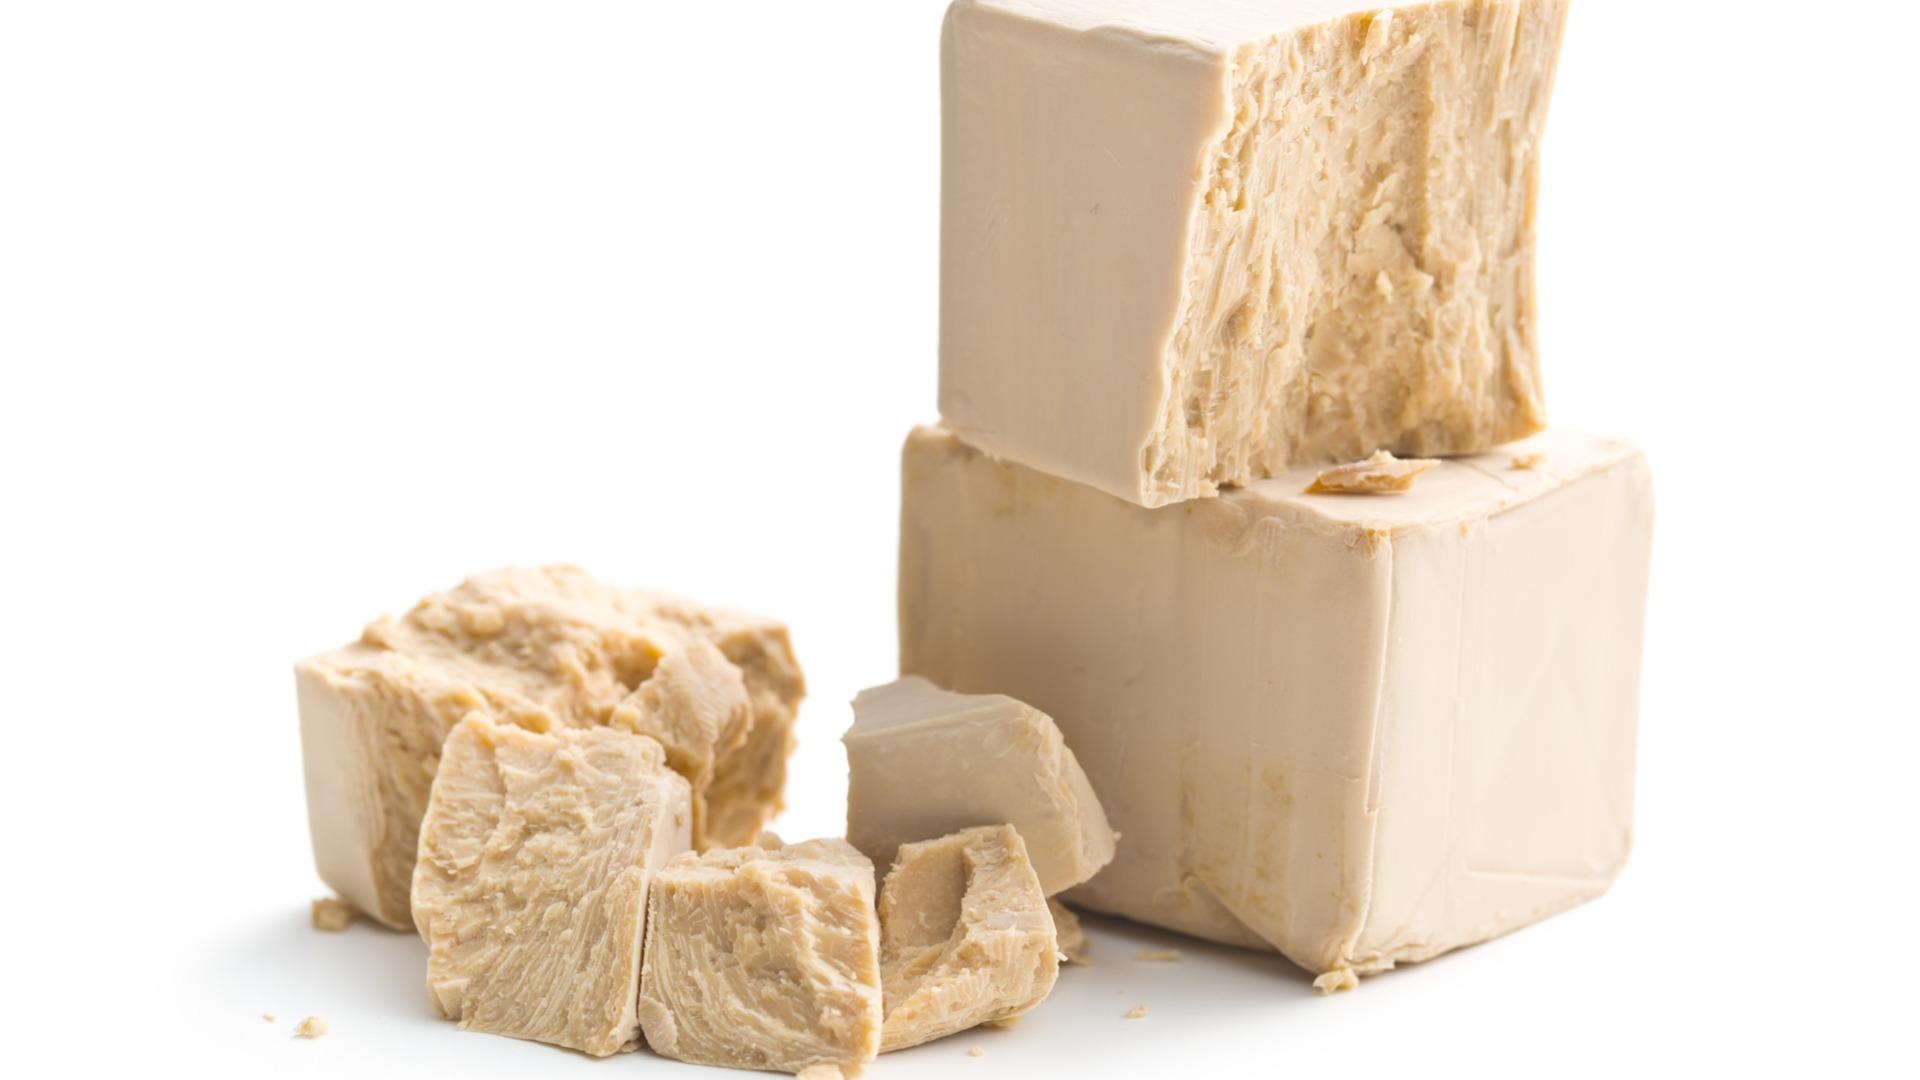 yeast, rising, baking